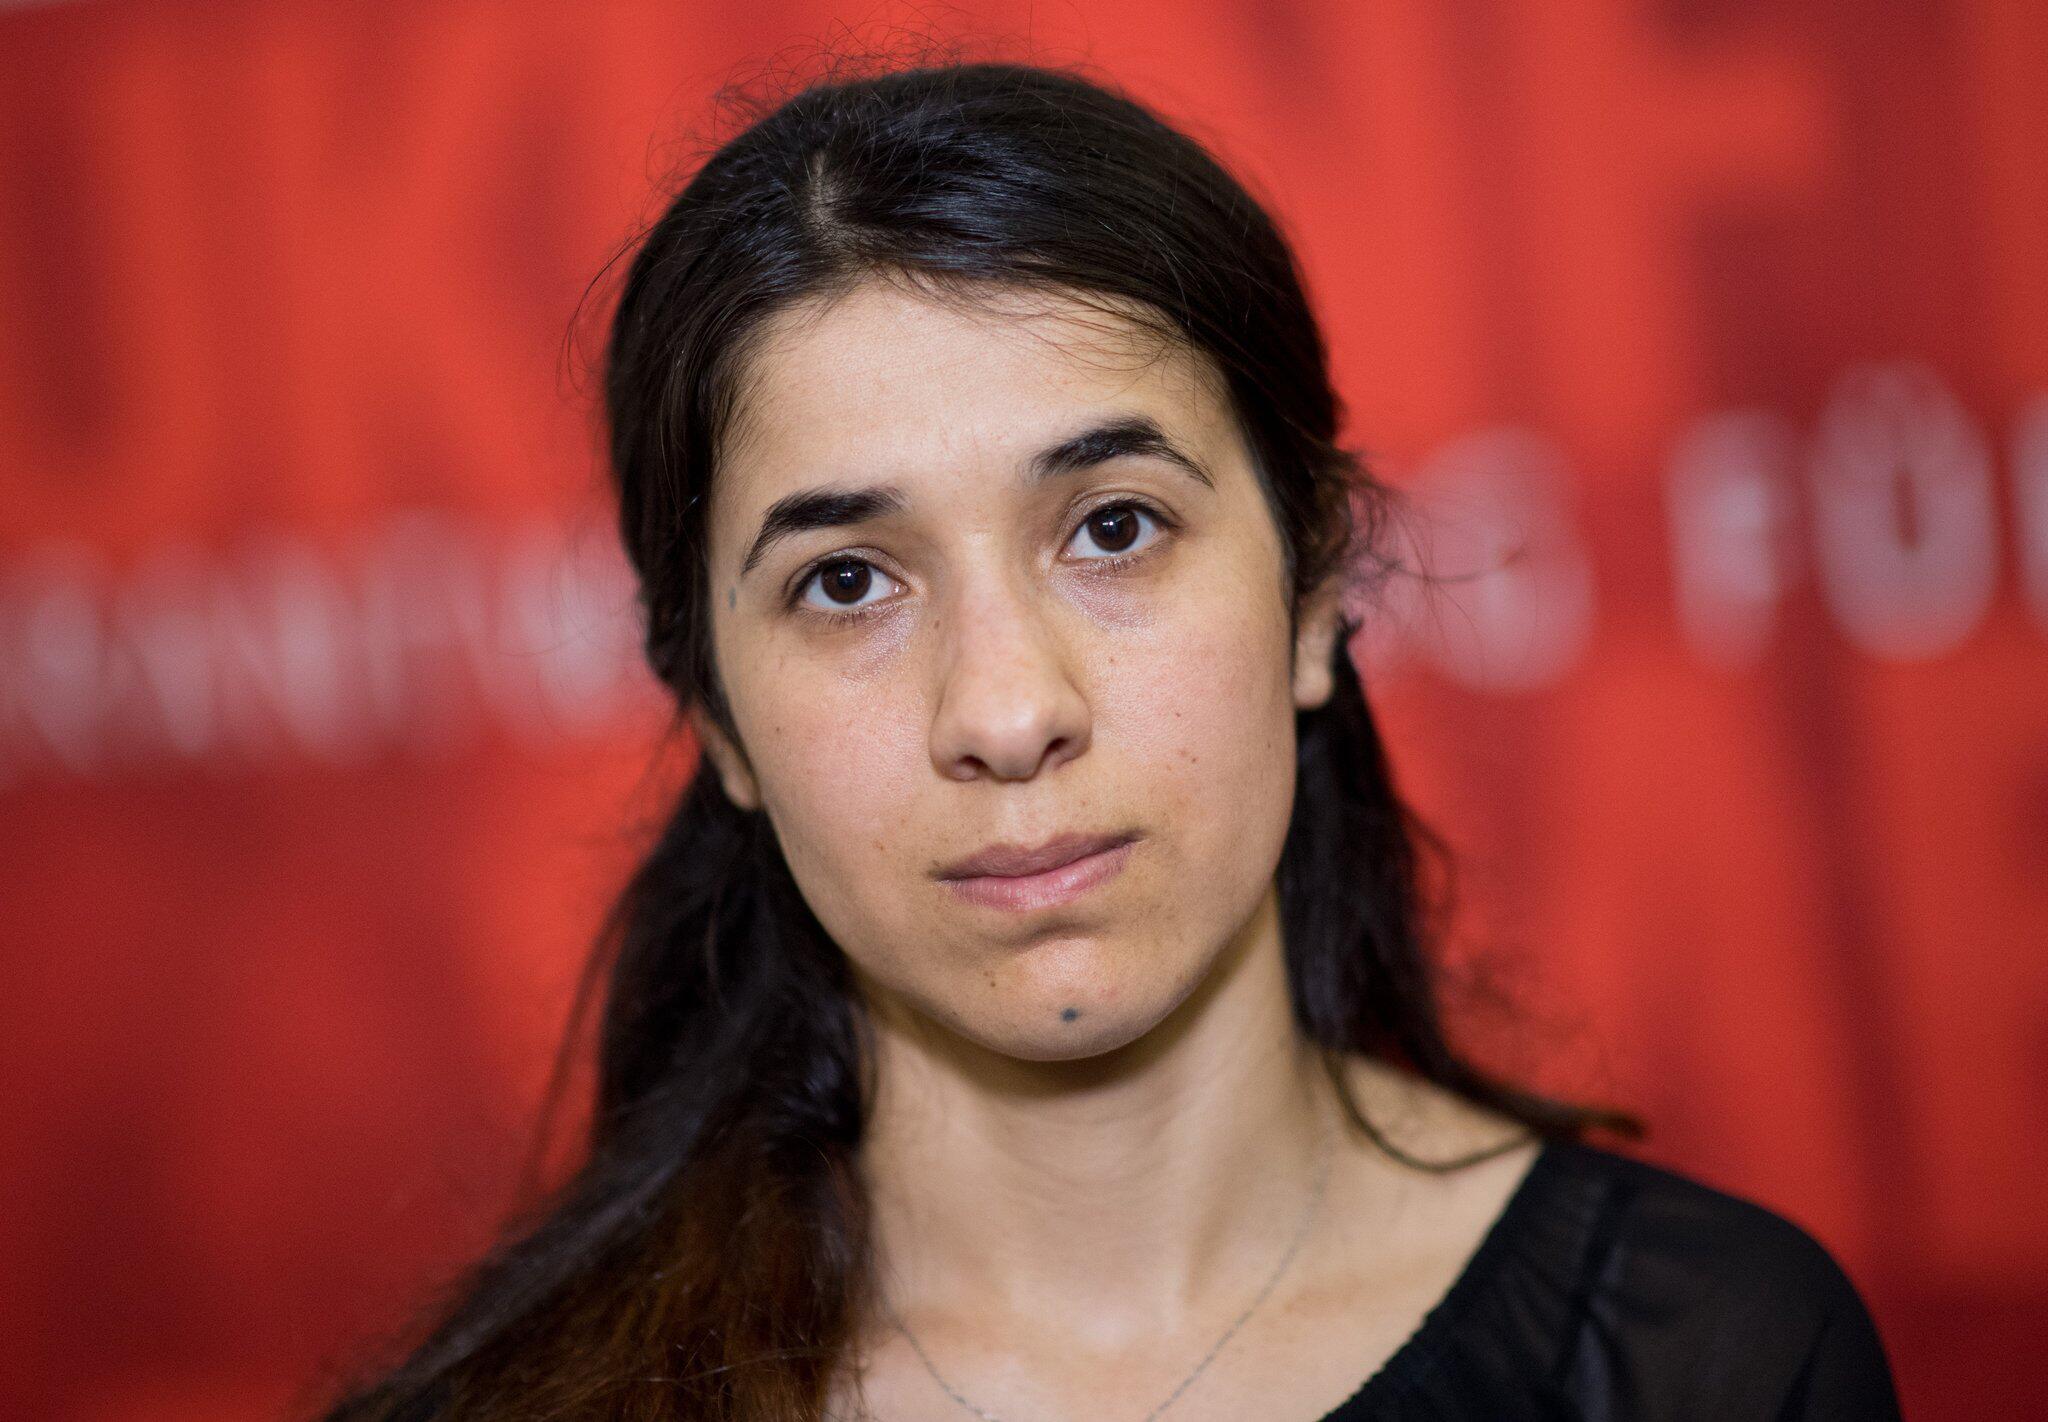 Bild zu Nadia Murad erhält Friedensnobelpreis 2018